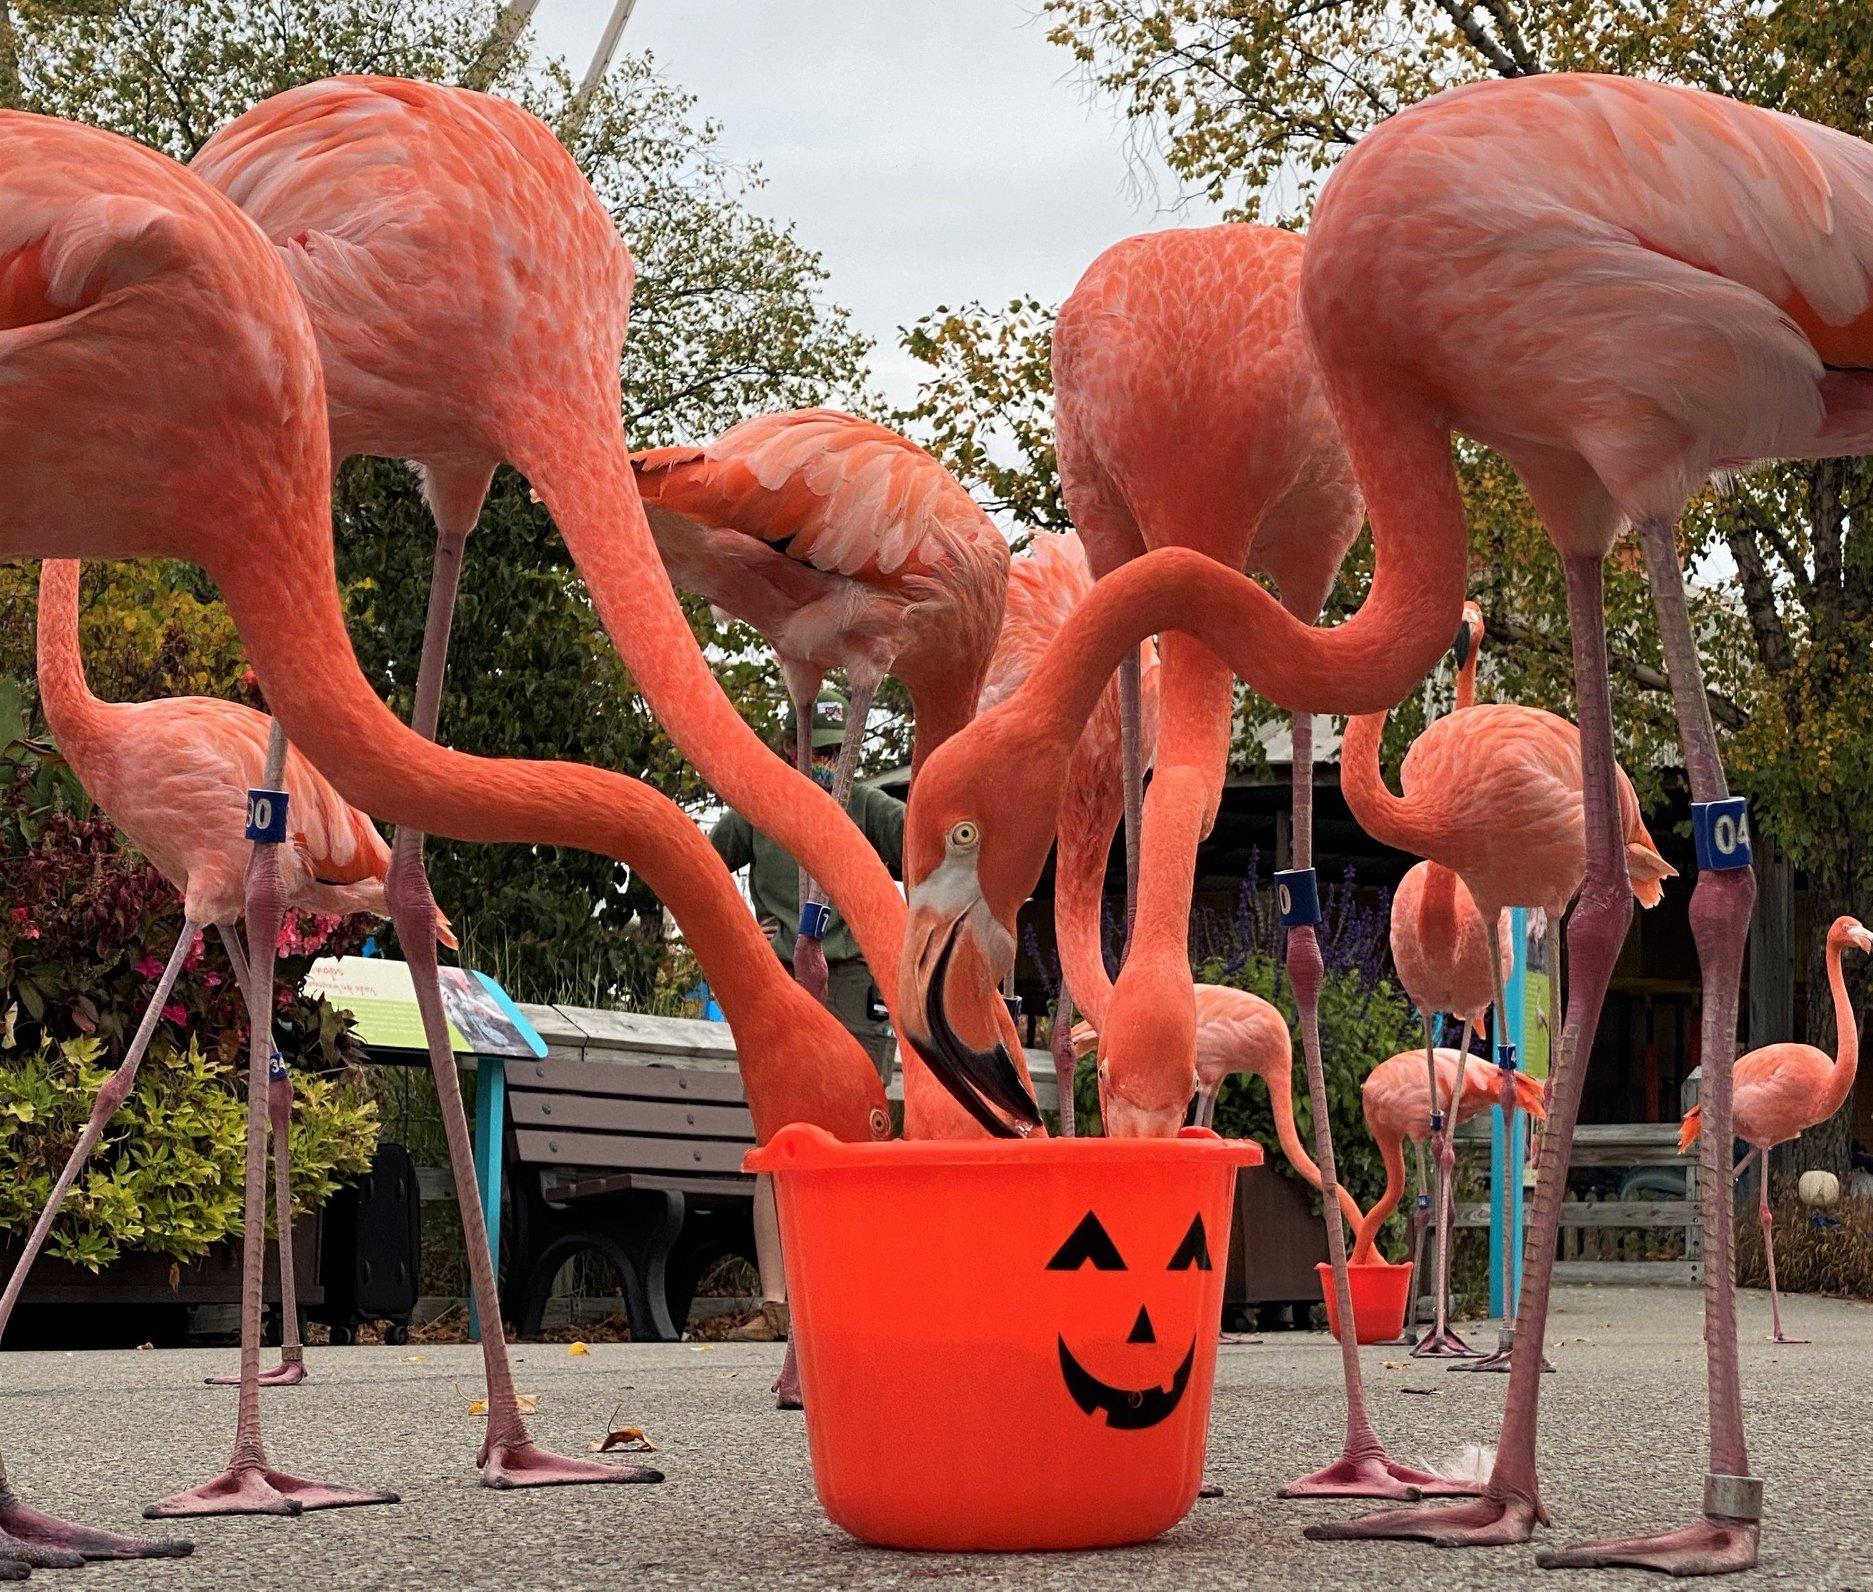 Indianapolis Zoo flamingoes celebrating Halloween